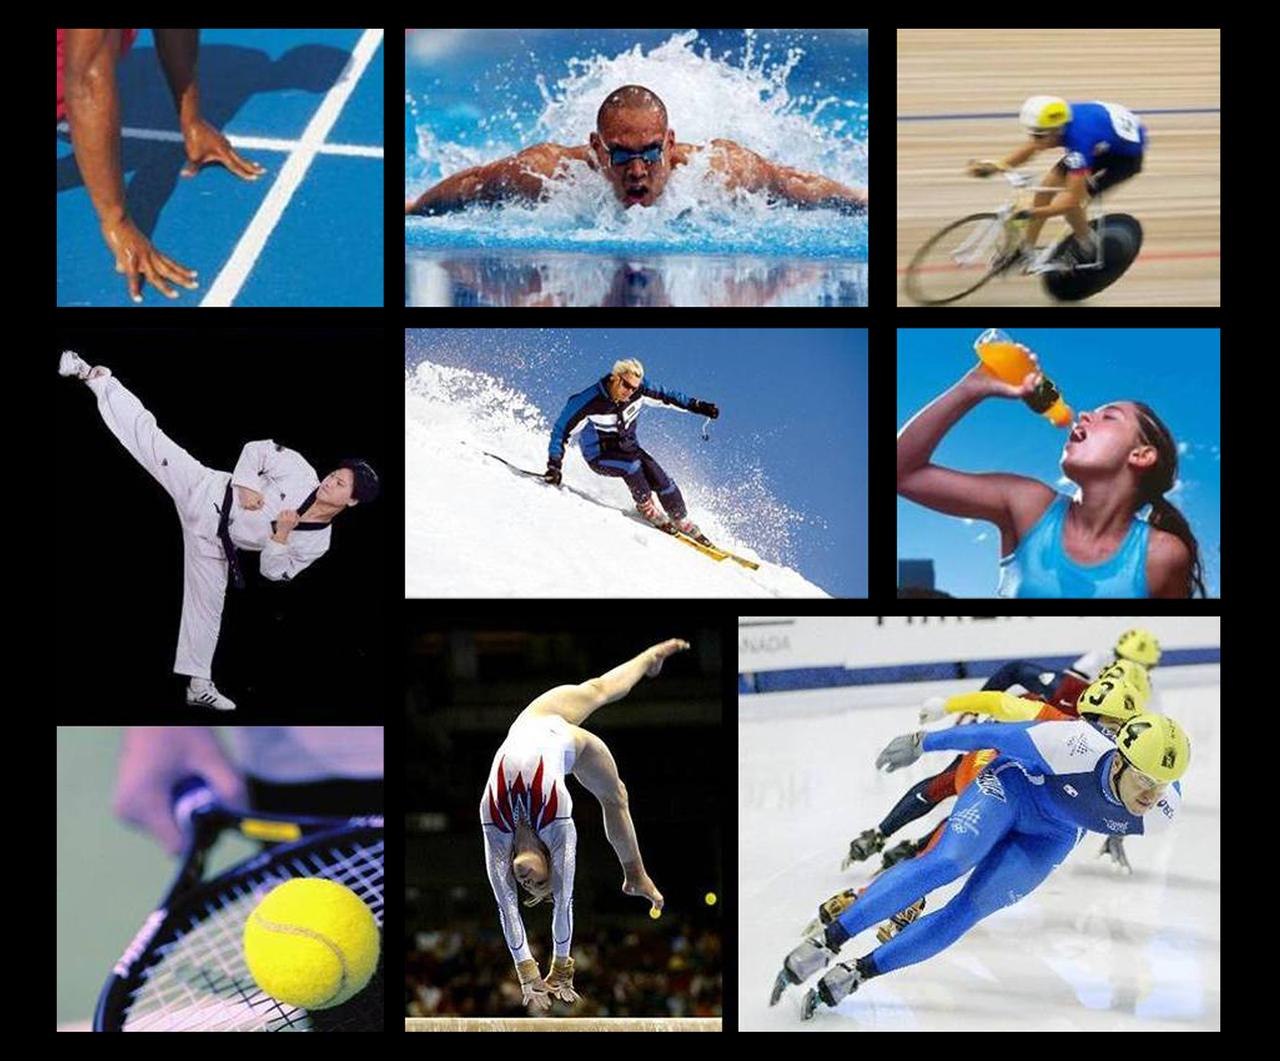 Картинка про все виды спорта